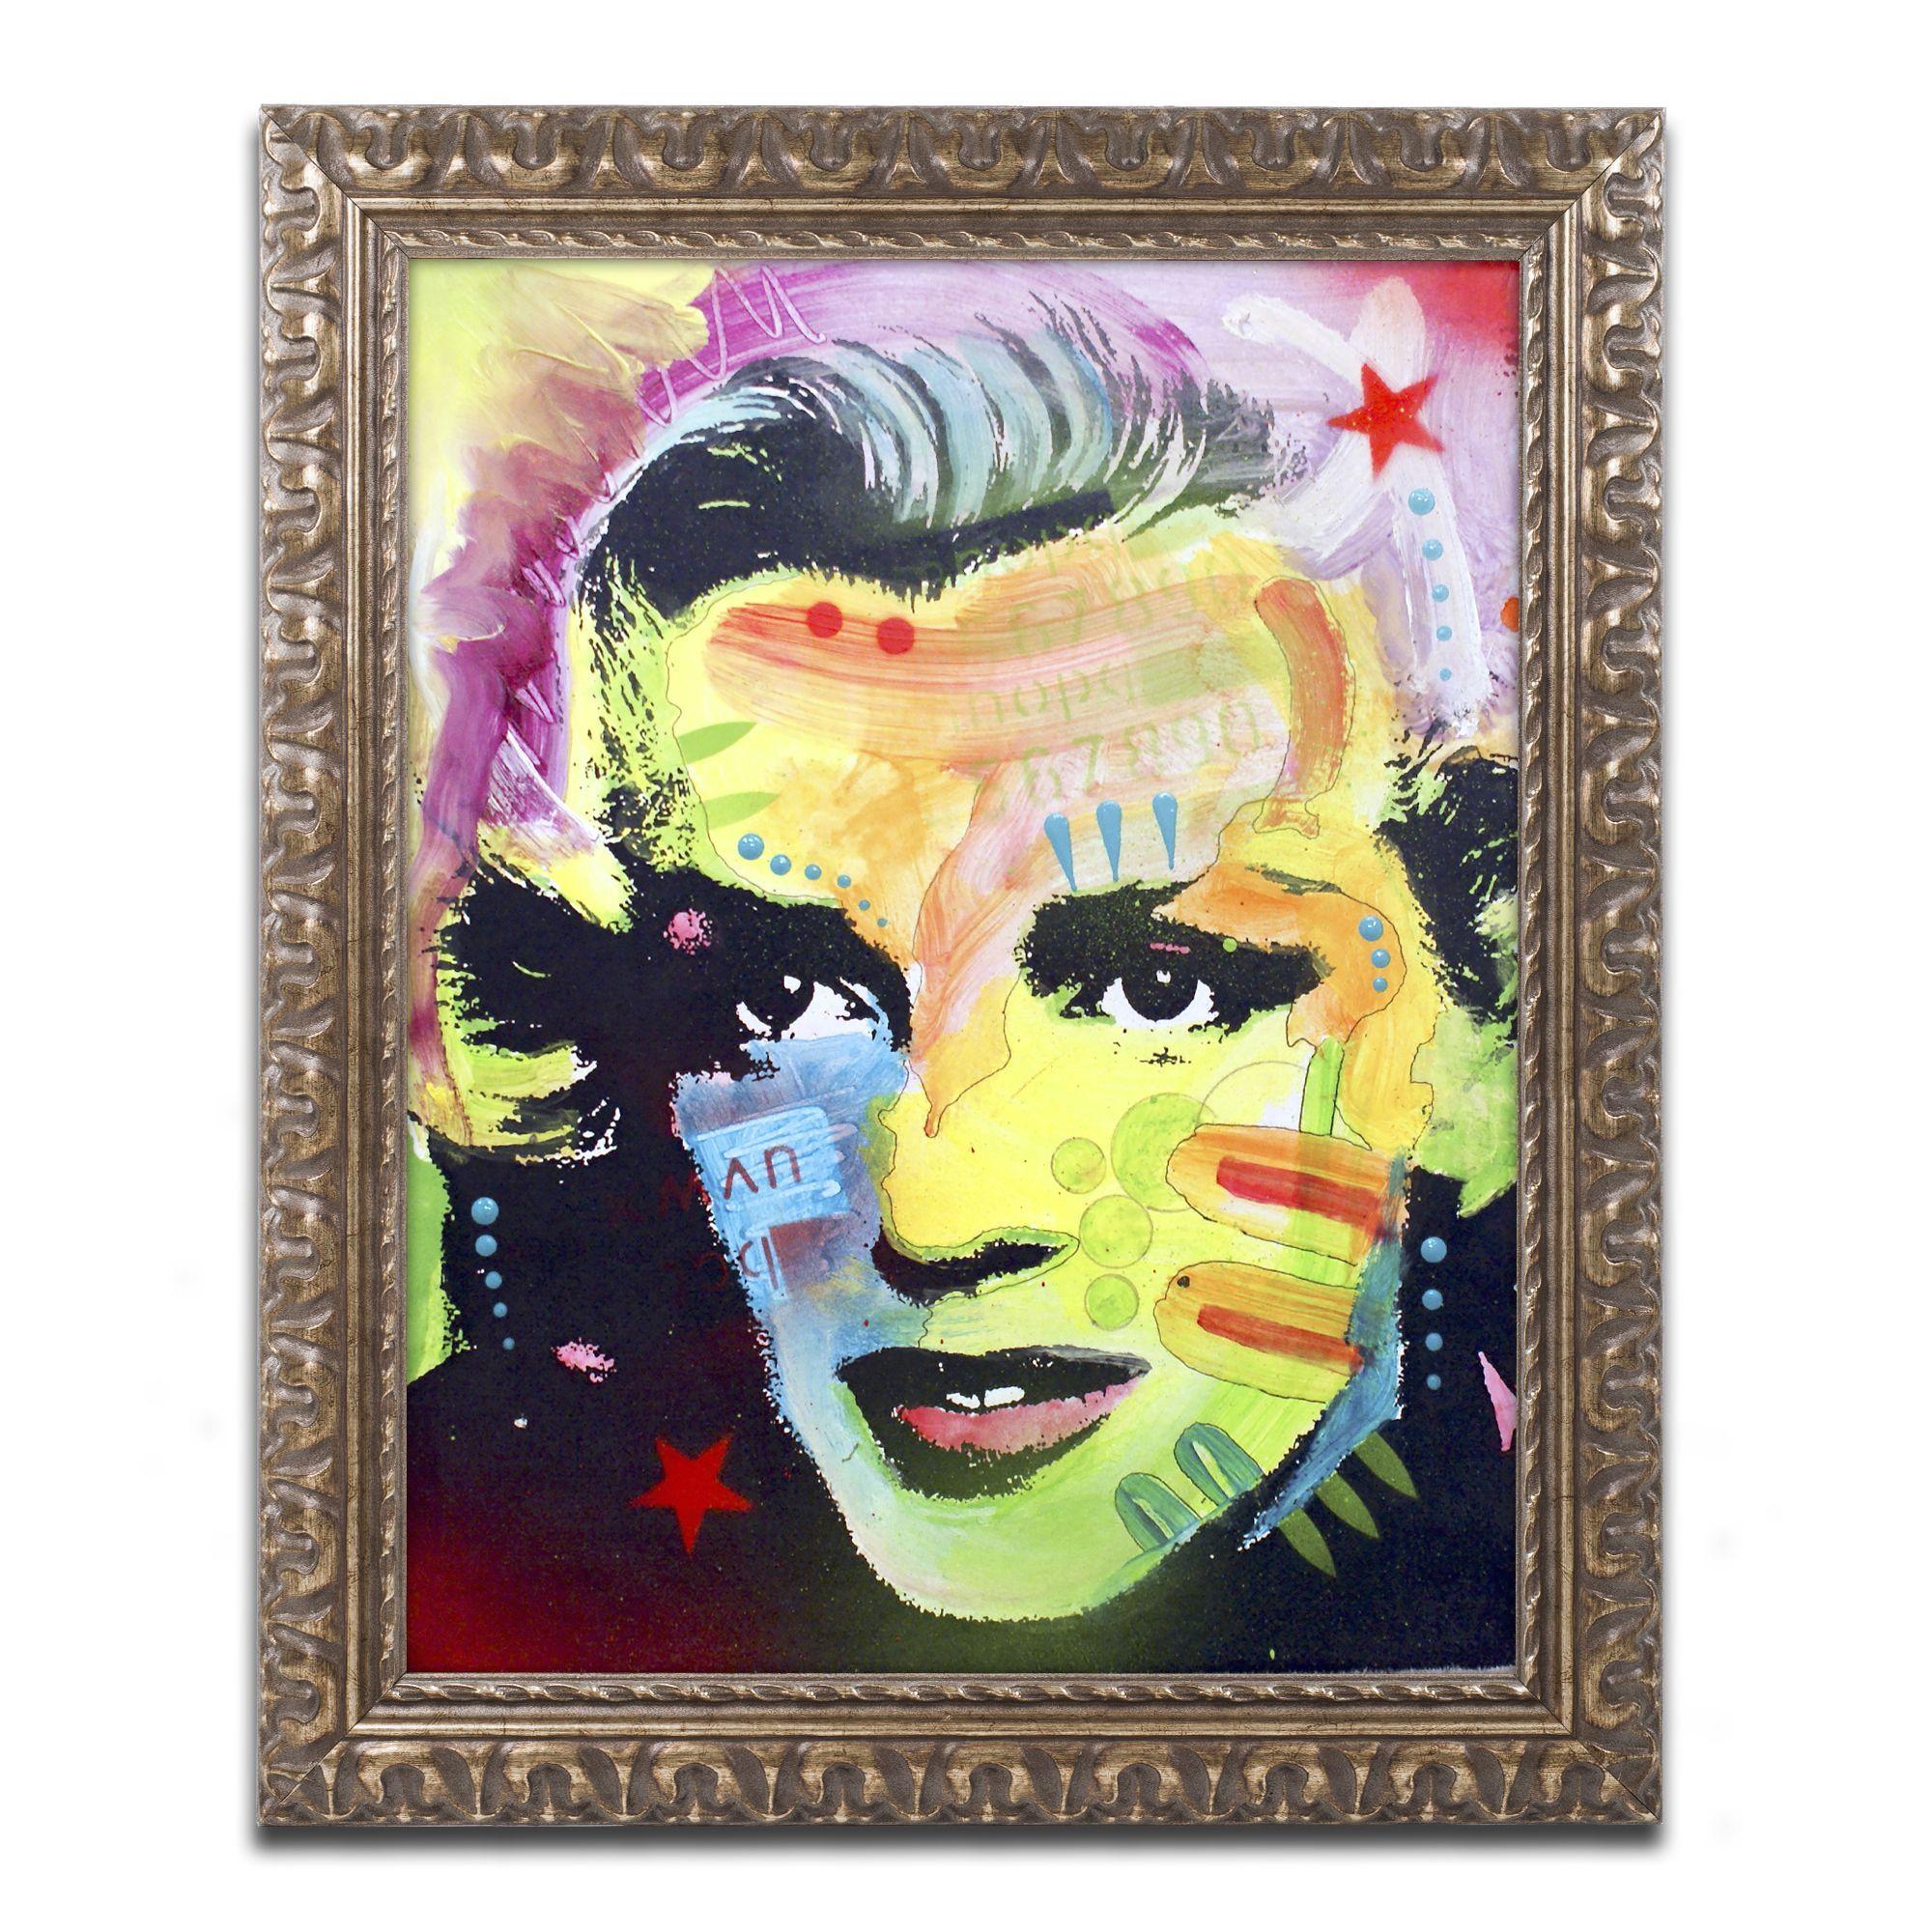 Dean Russo \'Marilyn Monroe I\' Ornate Framed Art | Products ...